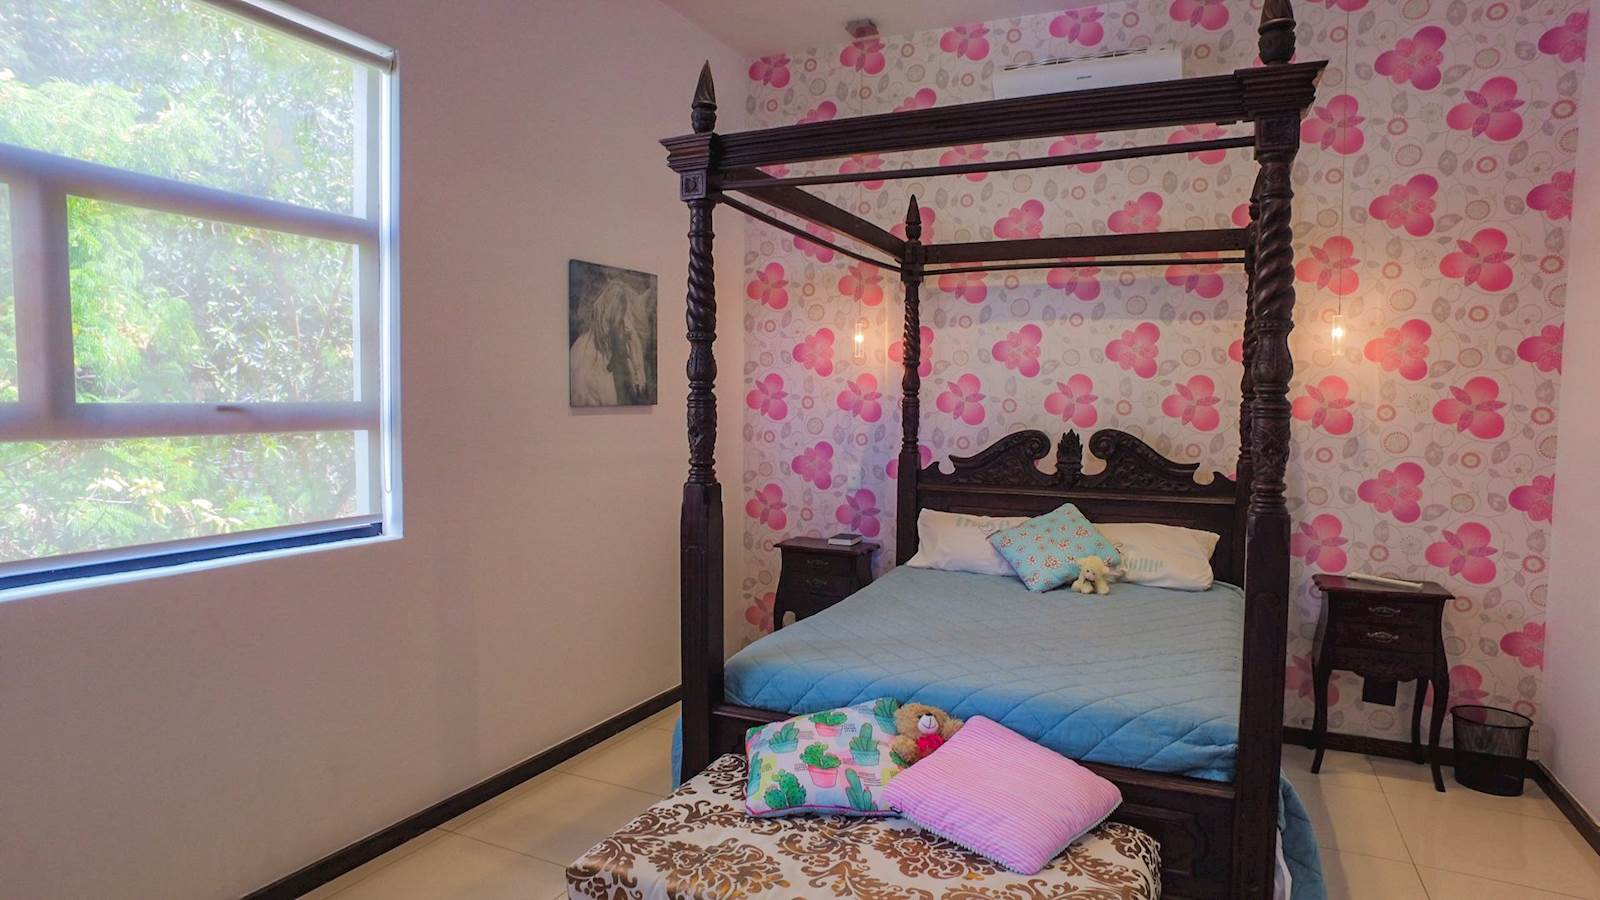 3 Bedroom House sold in Waterkloof Ridge ENT0010698 : photo#14